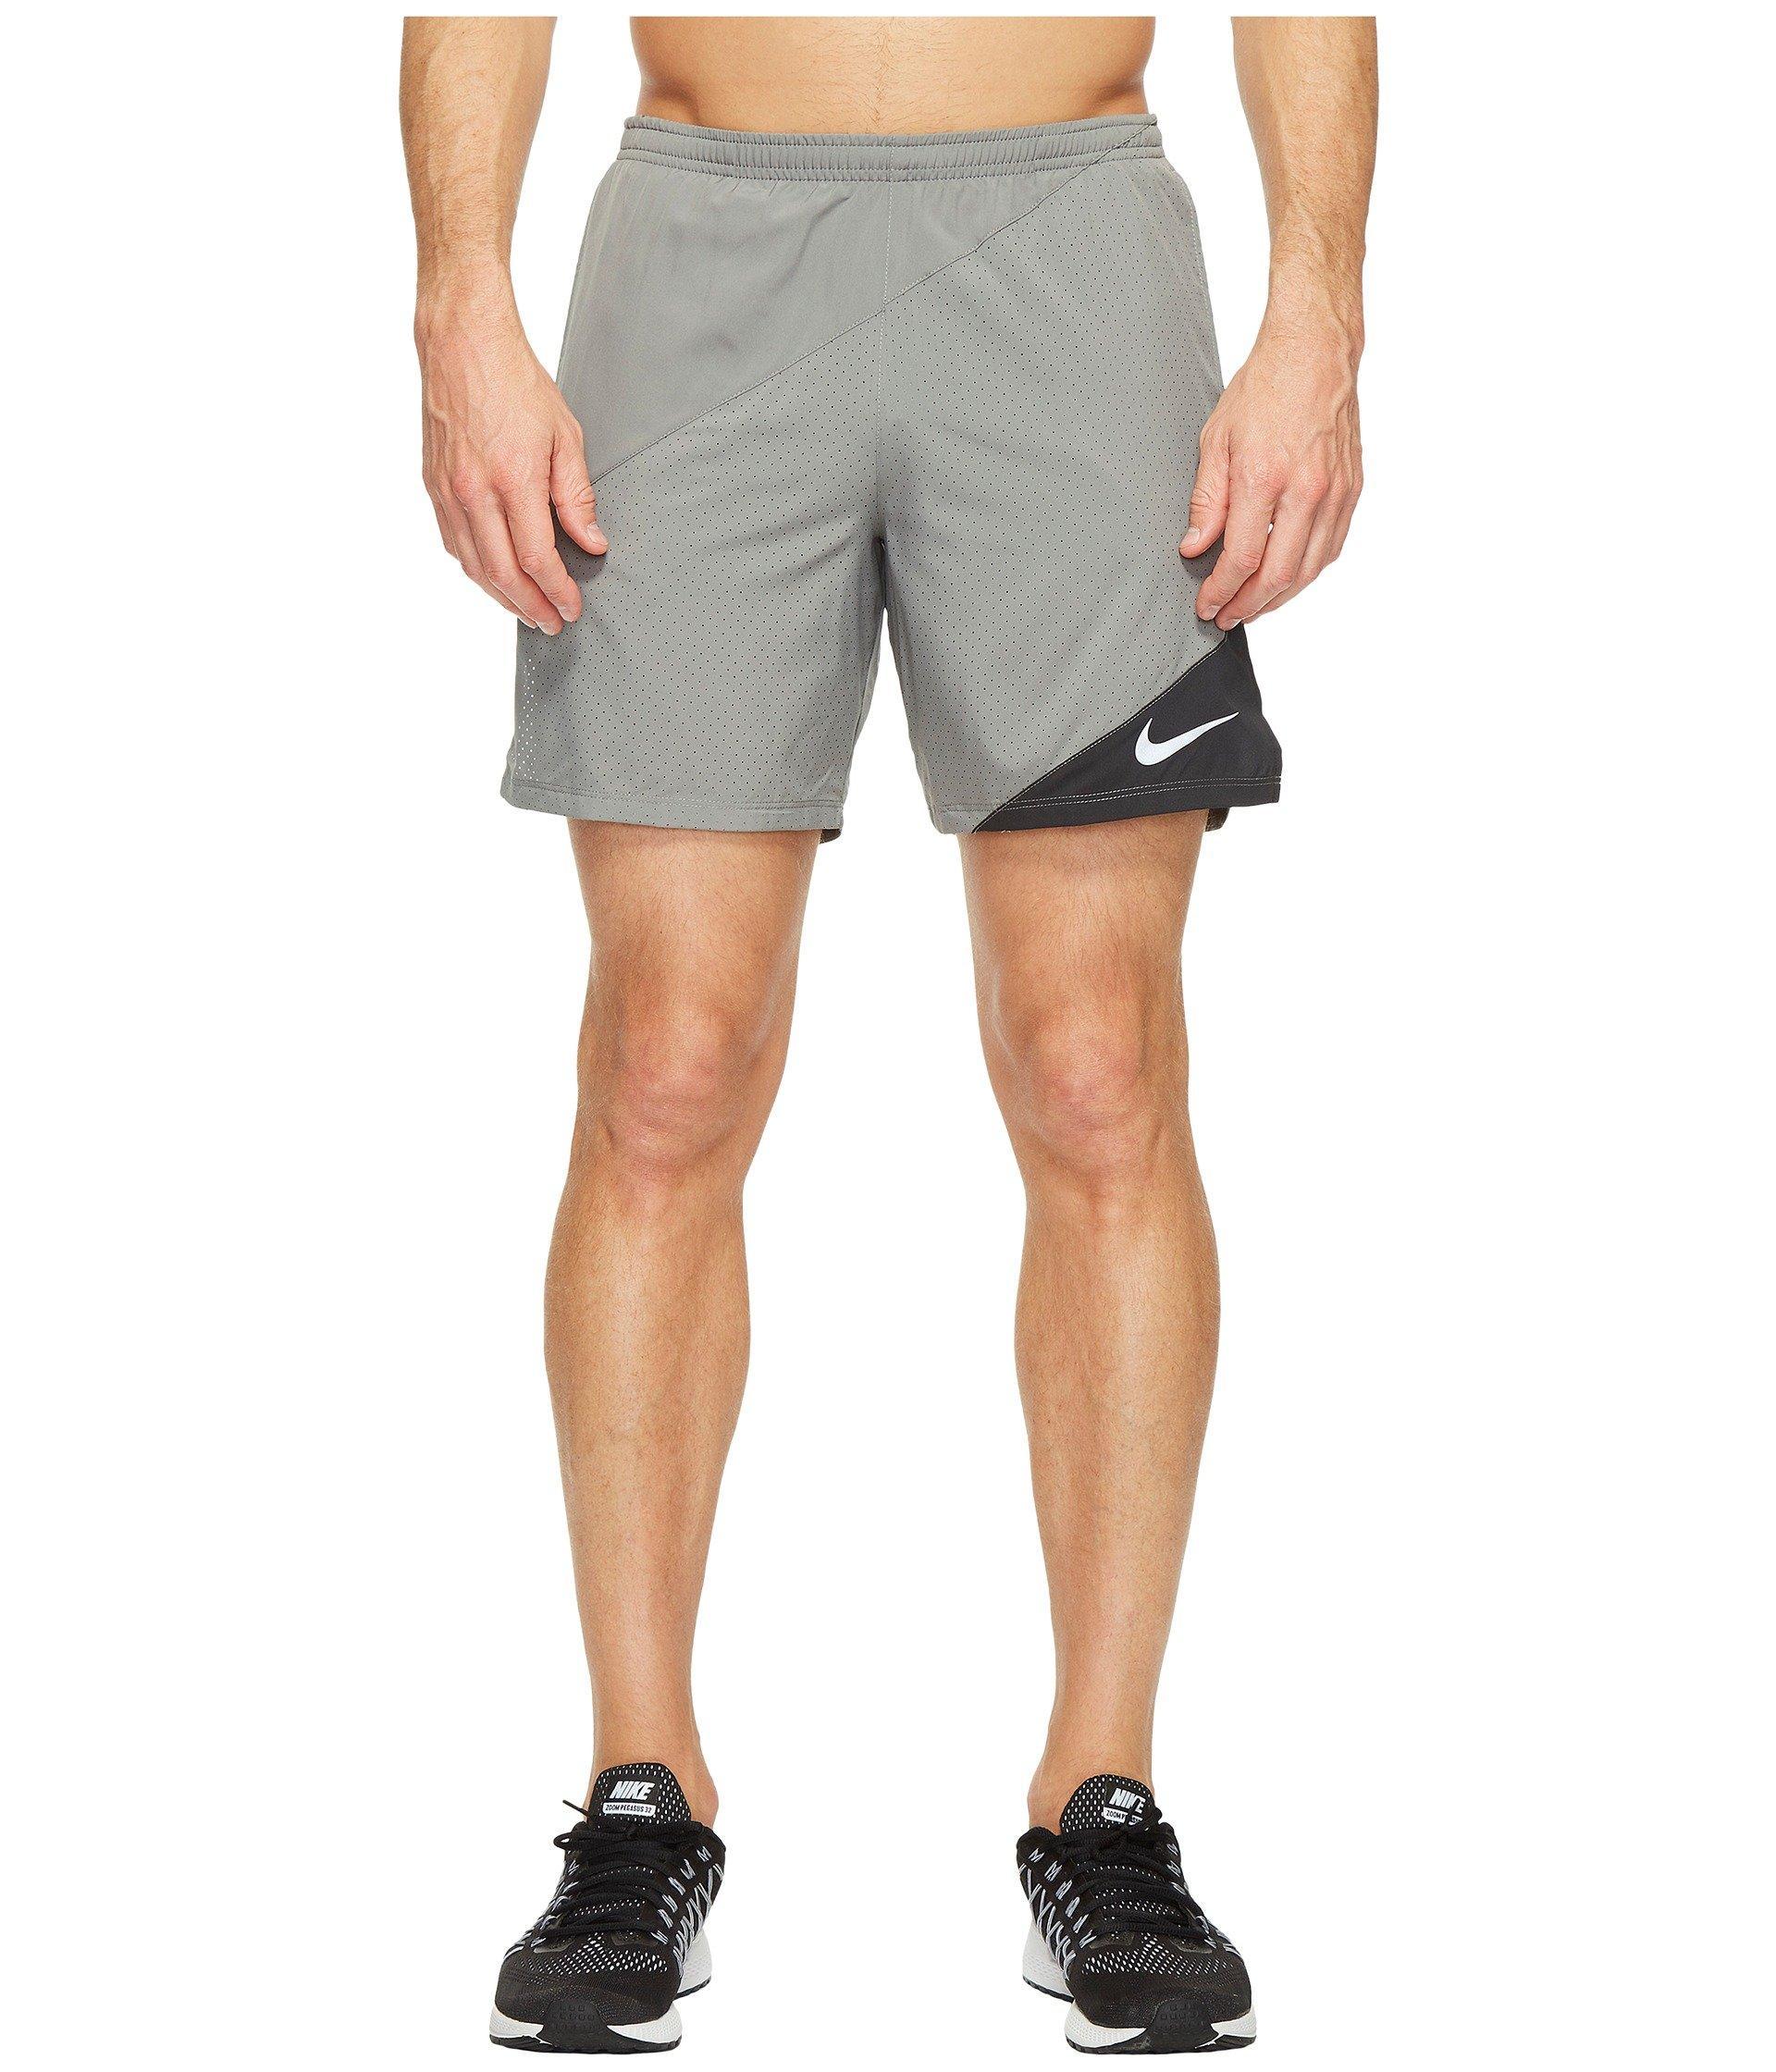 "Nike Distance 7"" Running Short In Tumbled Grey/black"